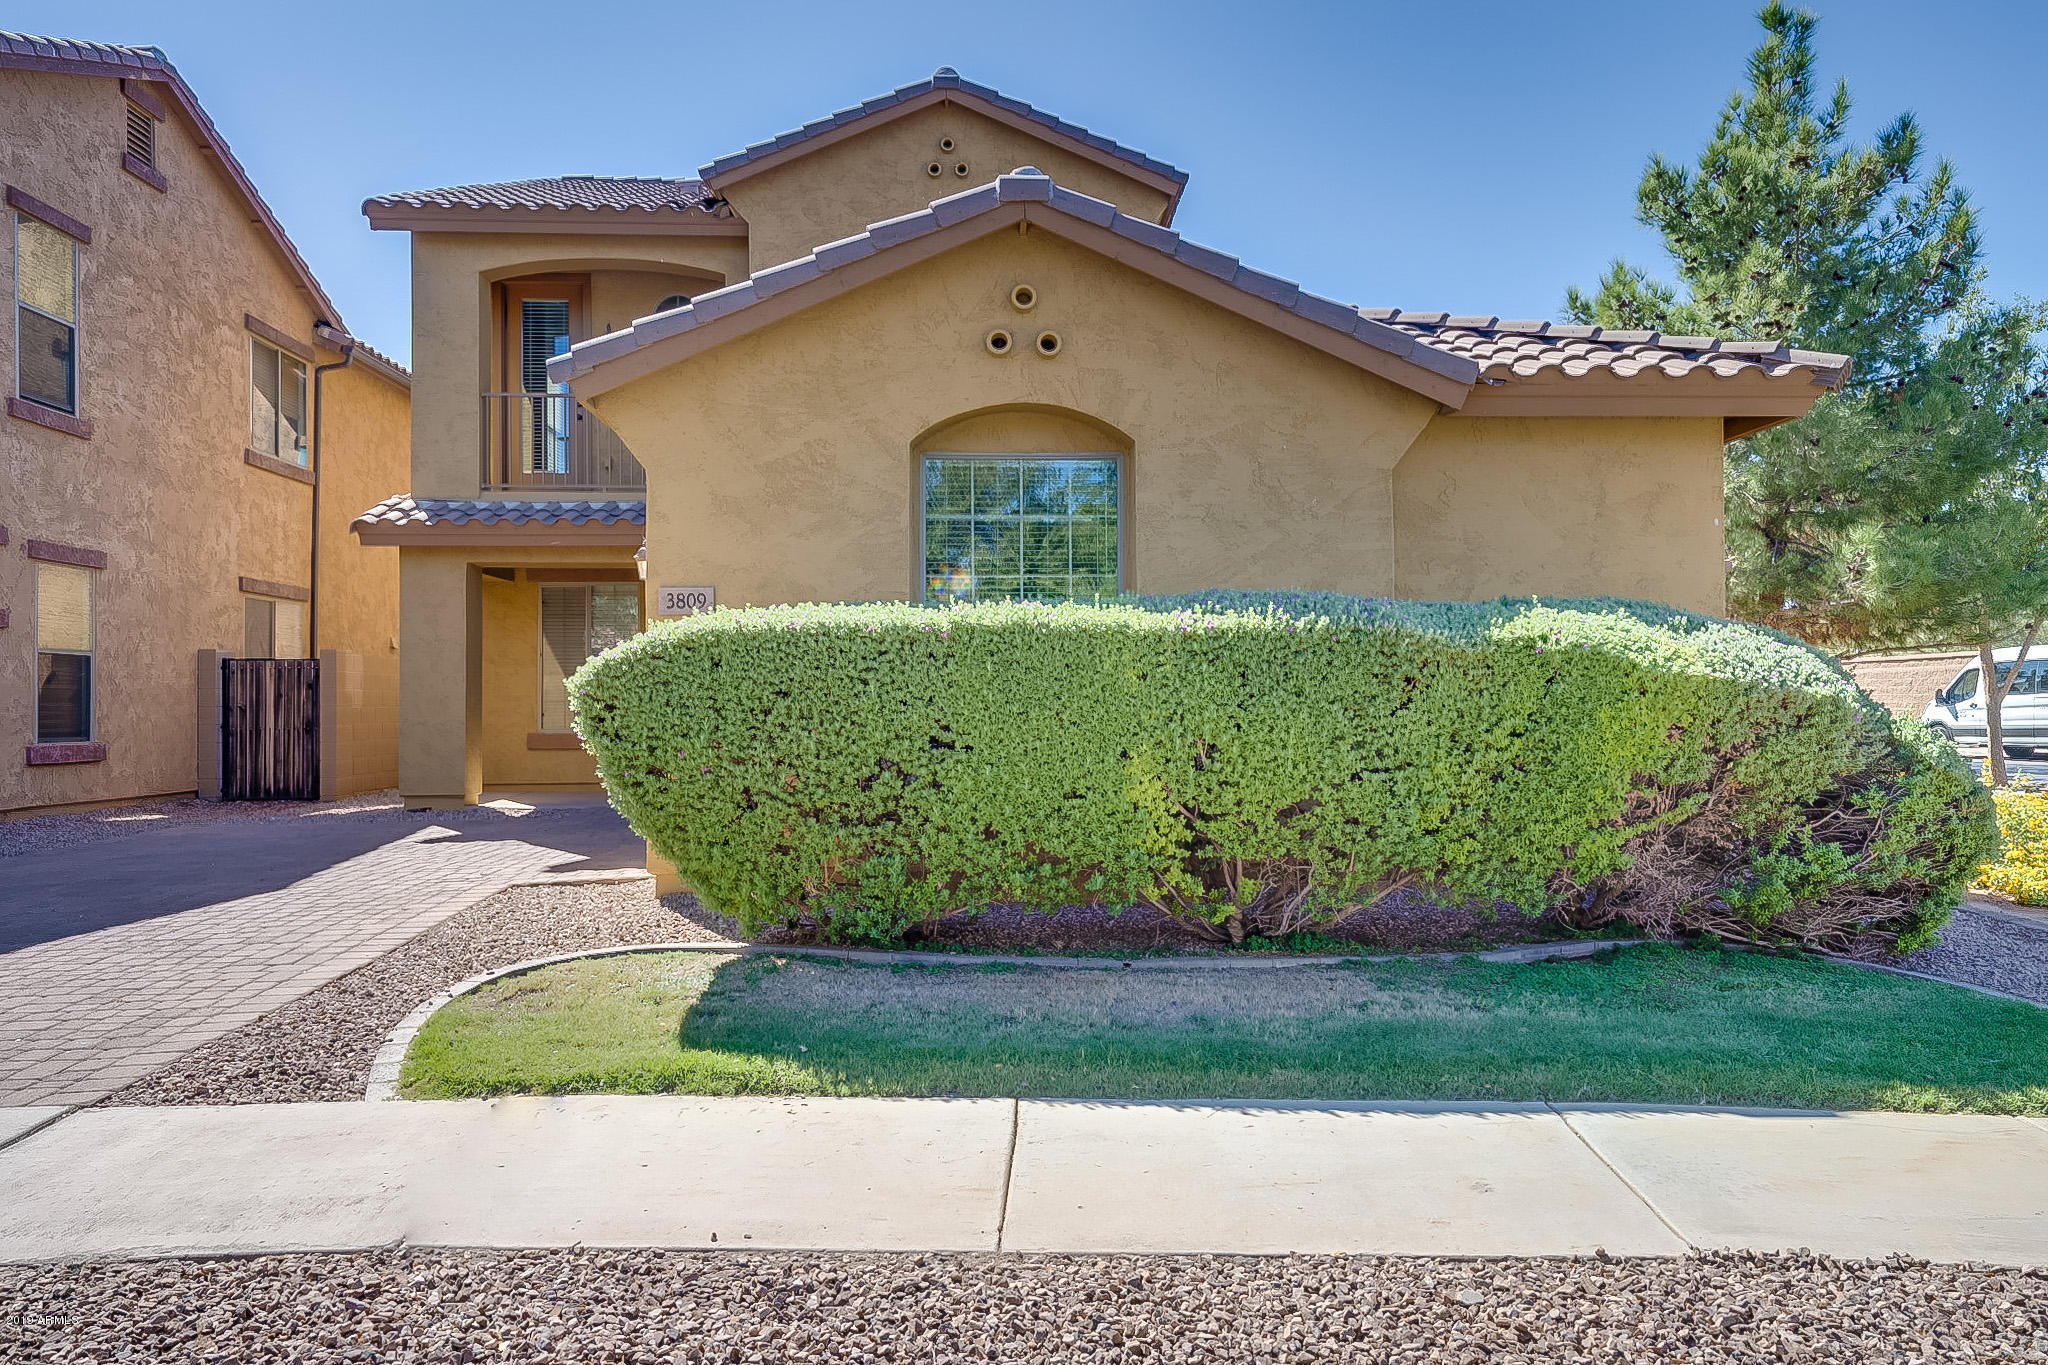 Photo of 3809 E MORELOS Street, Gilbert, AZ 85295